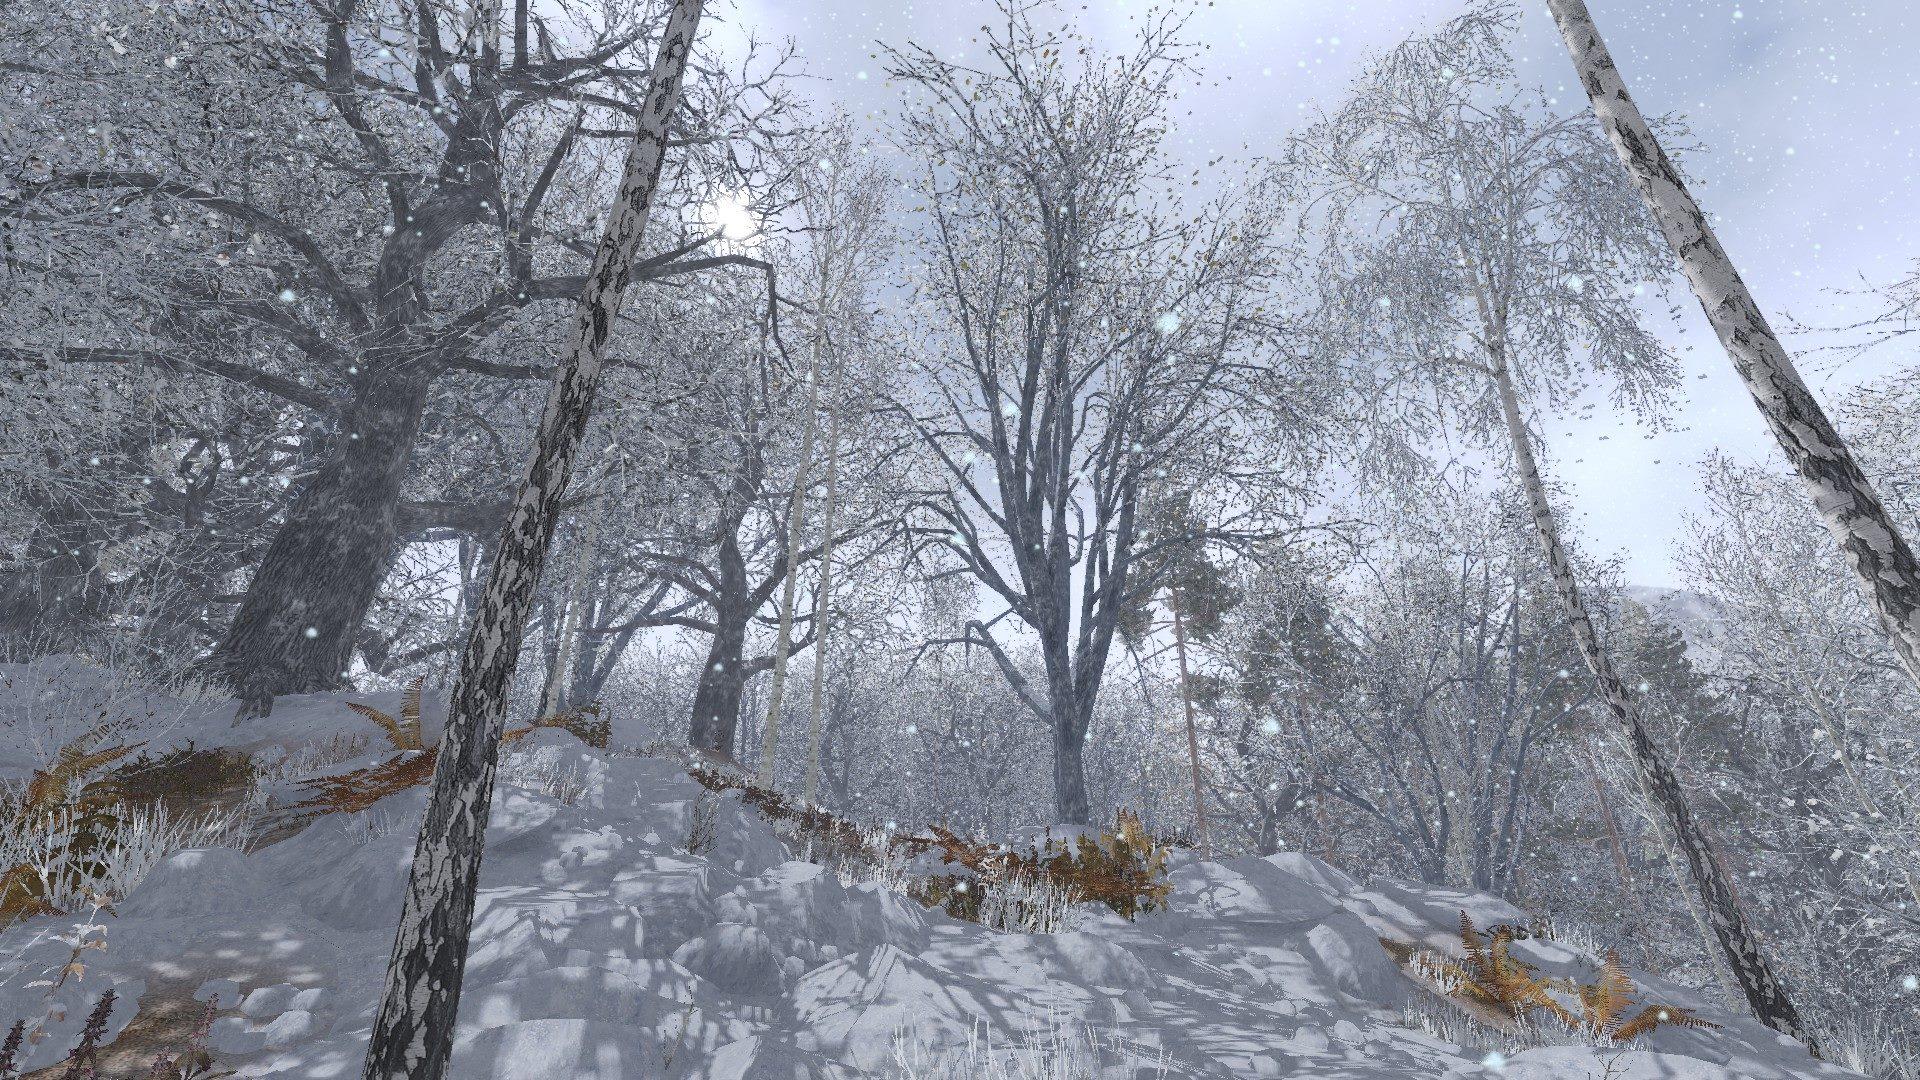 Life is feudal your own зима большая ролевая игра